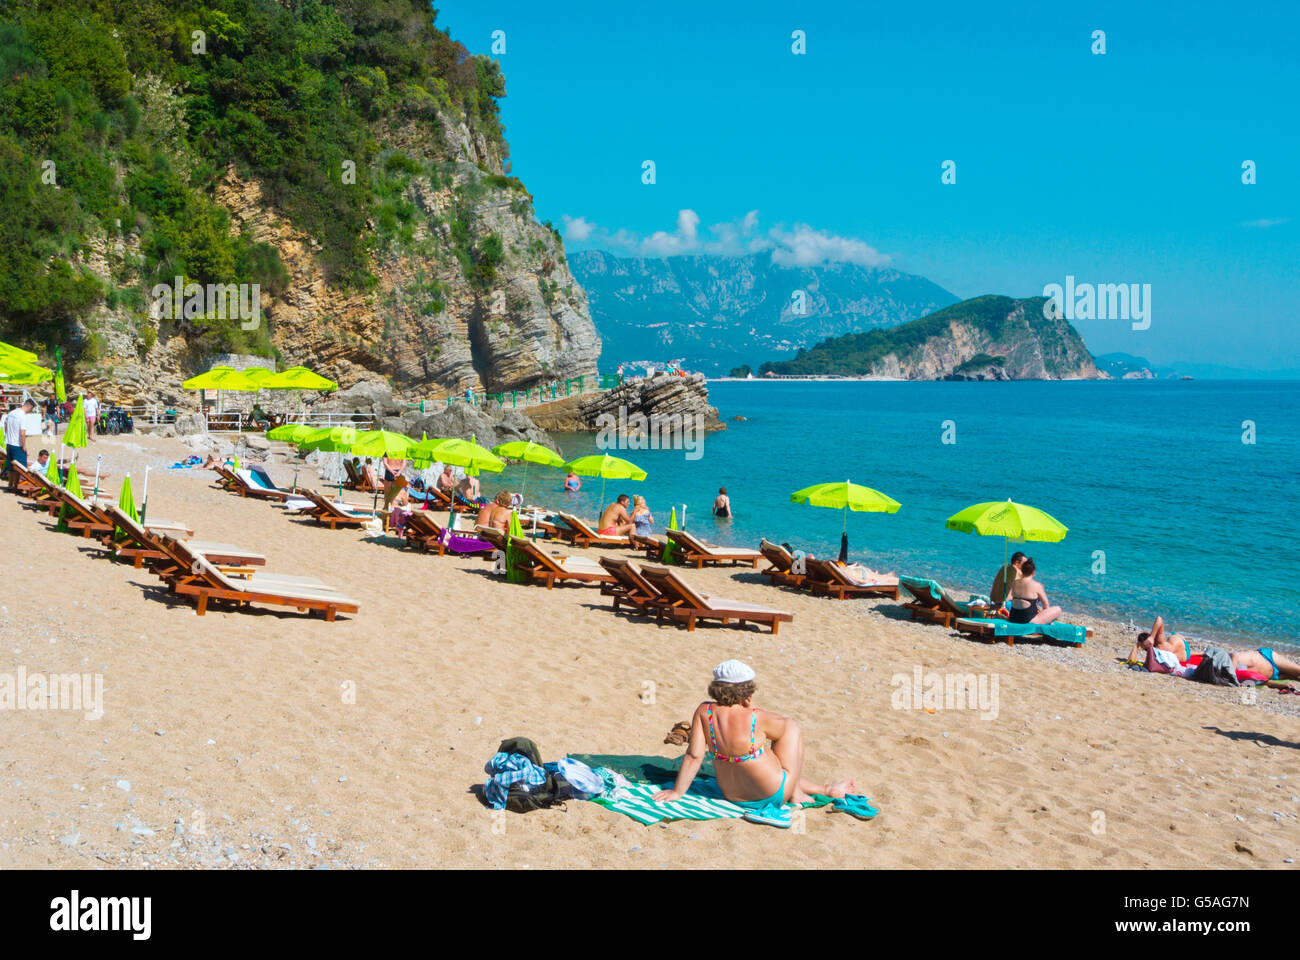 Plaza Mogren, Mogren beach, Budva, Montenegro, Europe Stock Photo